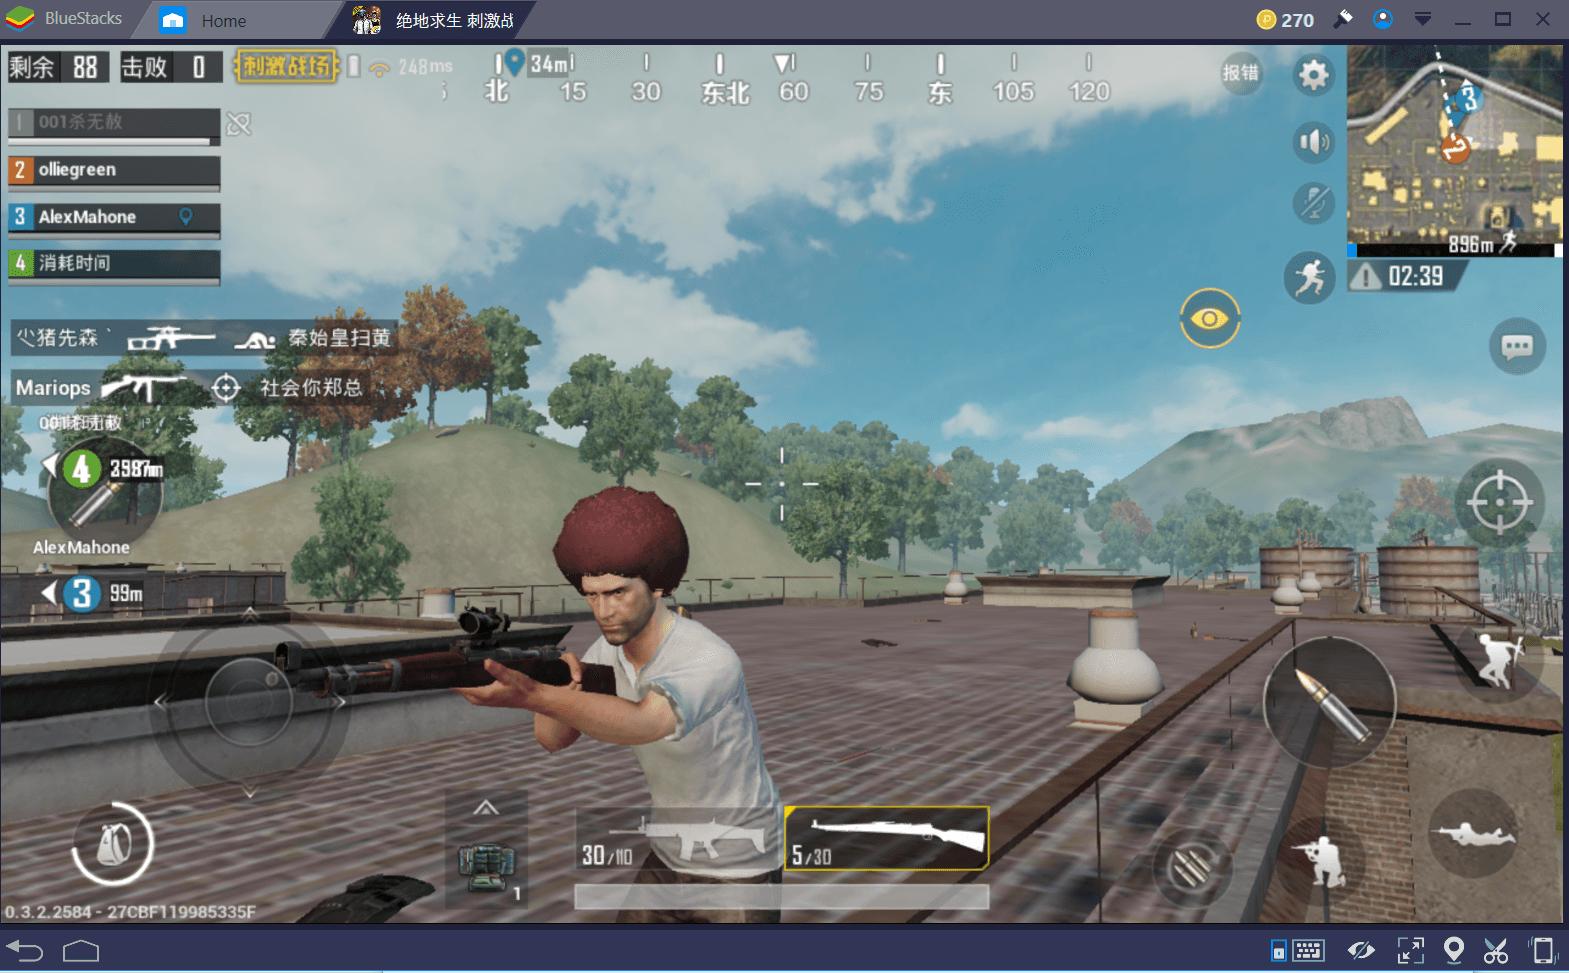 Ultimate PUBG Mobile Weapon Guide